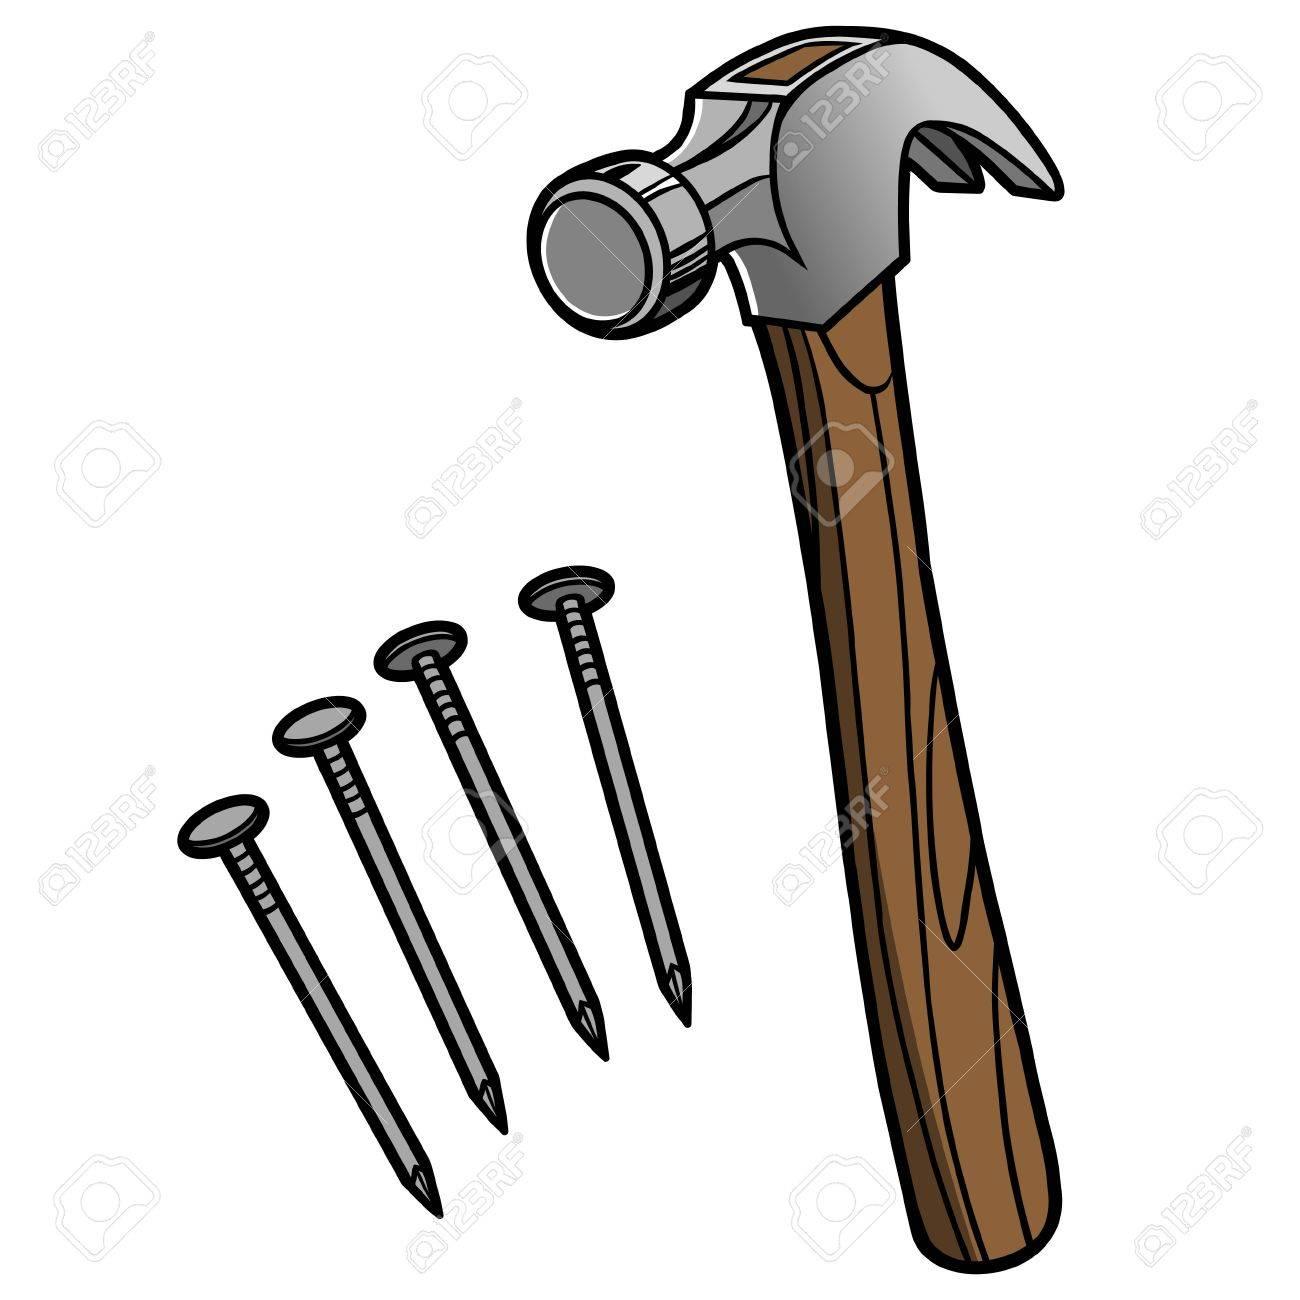 hammer and nails royalty free cliparts vectors and stock illustration image 57535472 hammer and nails